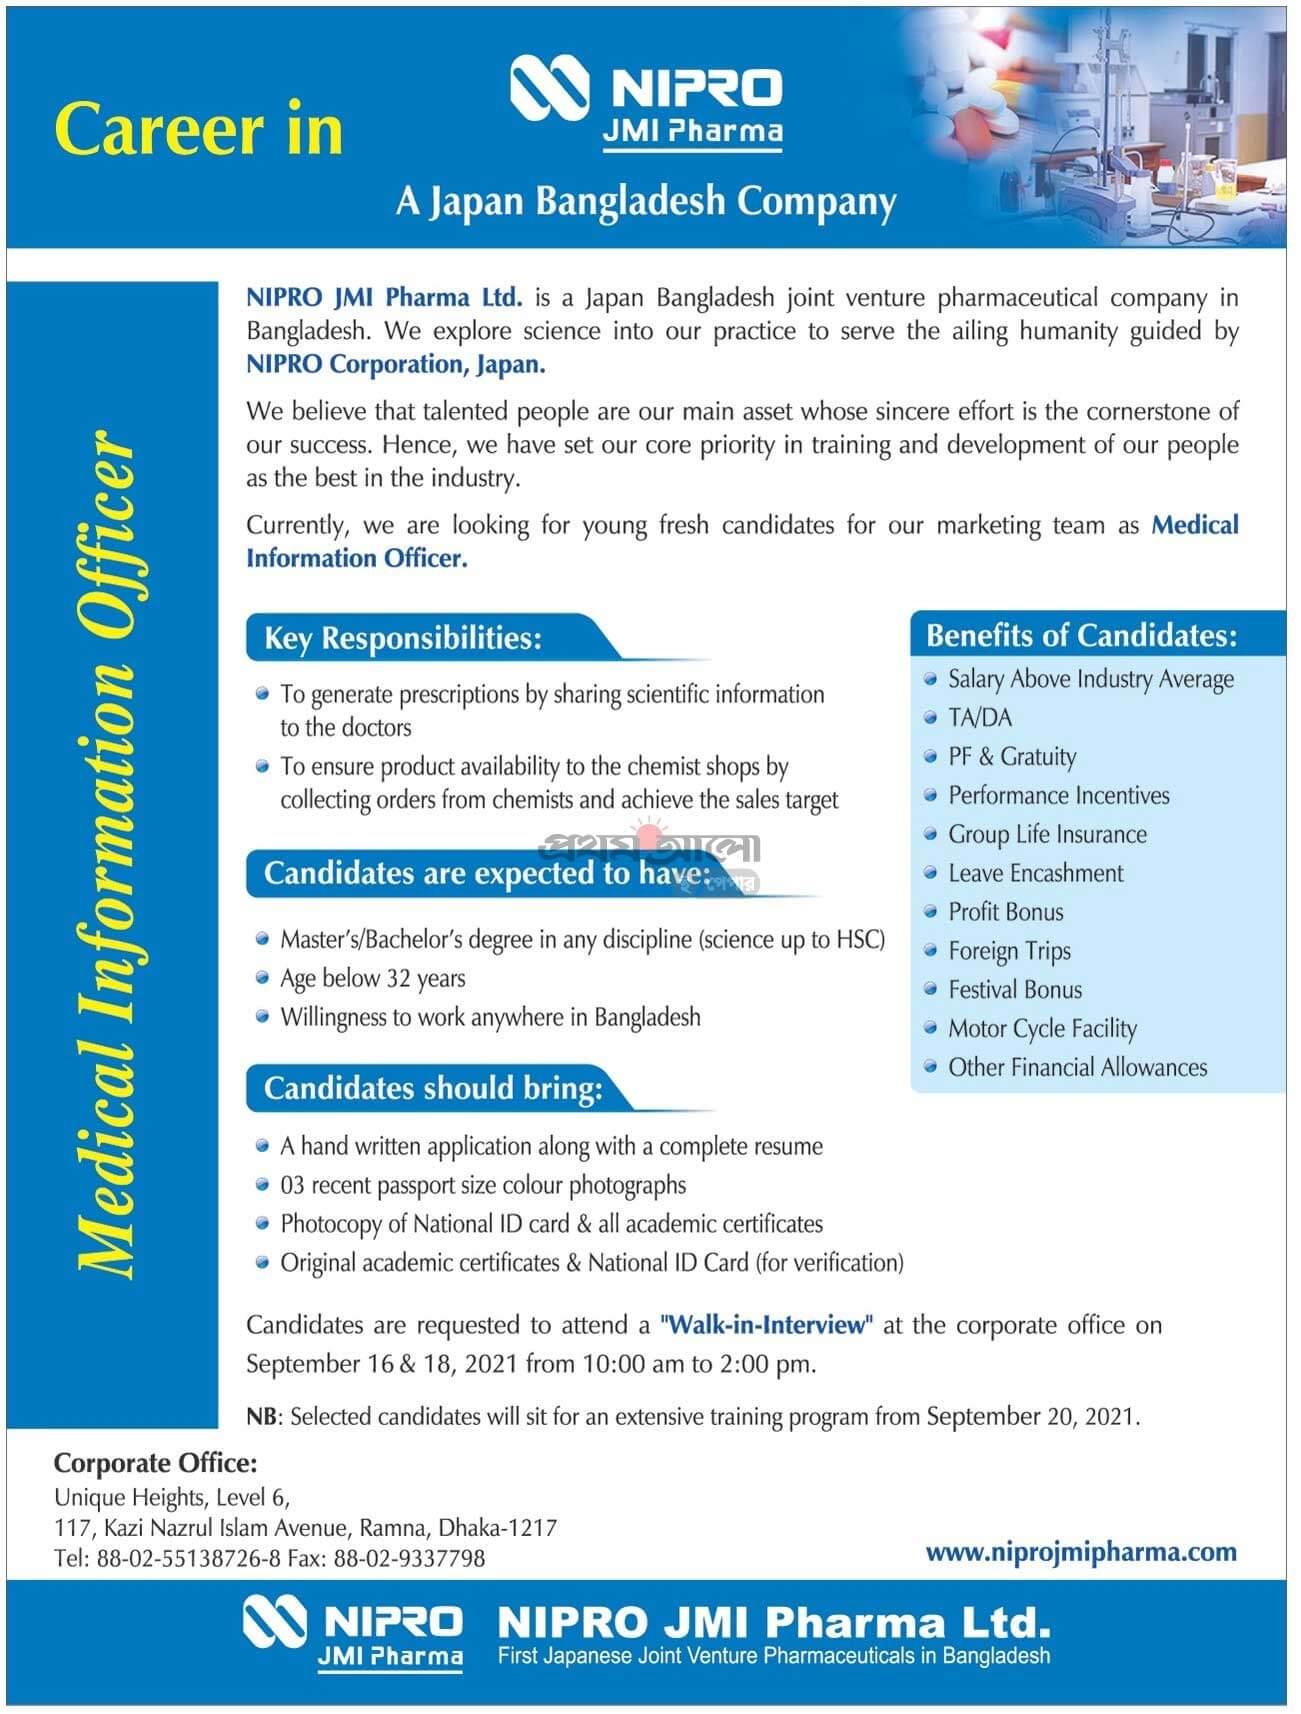 NIPRO JMI Pharma Job Circular image 2021